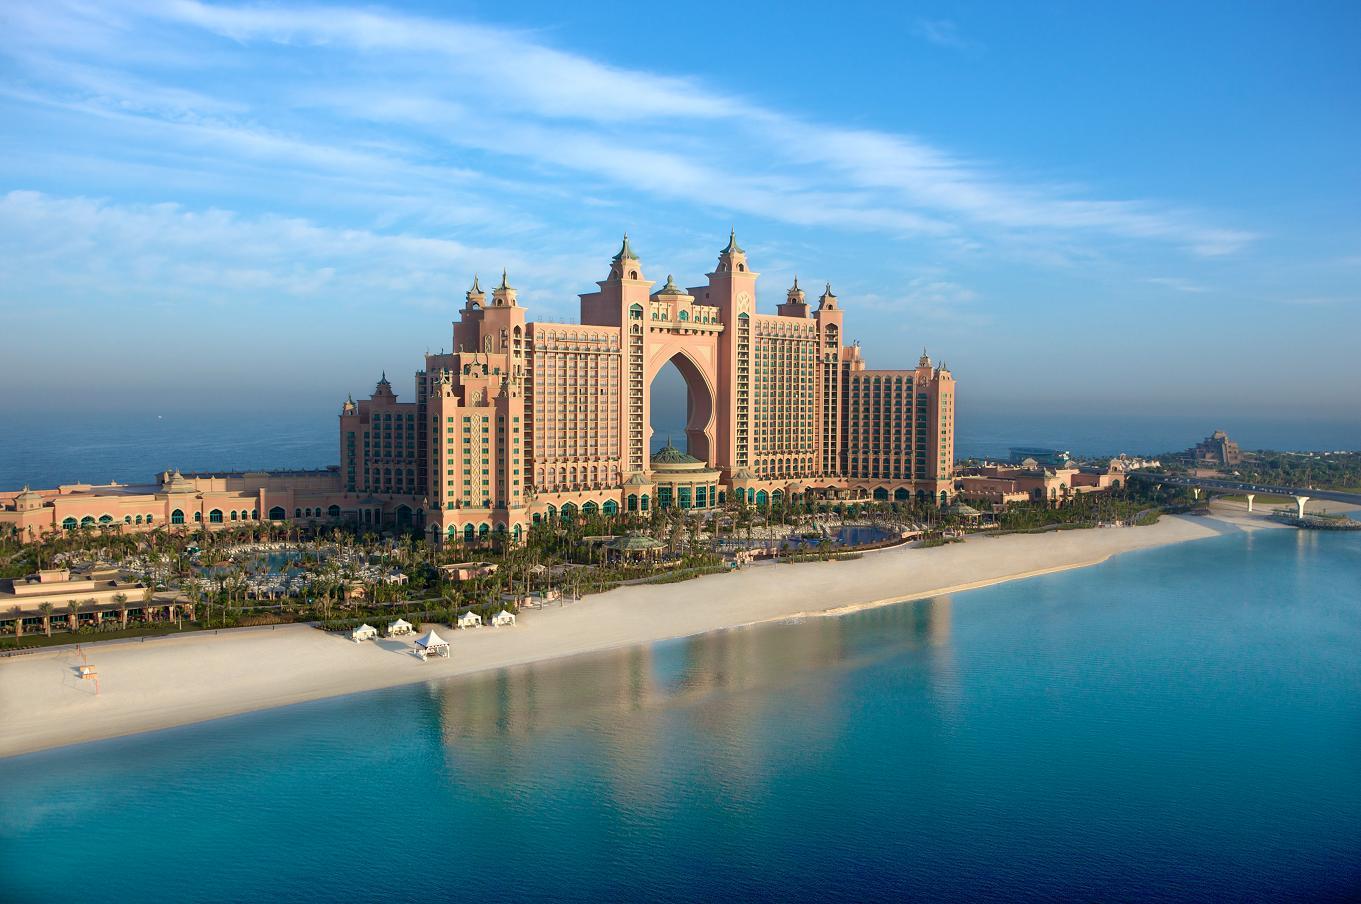 Atlantis, Palm Jumeriah, Dubai